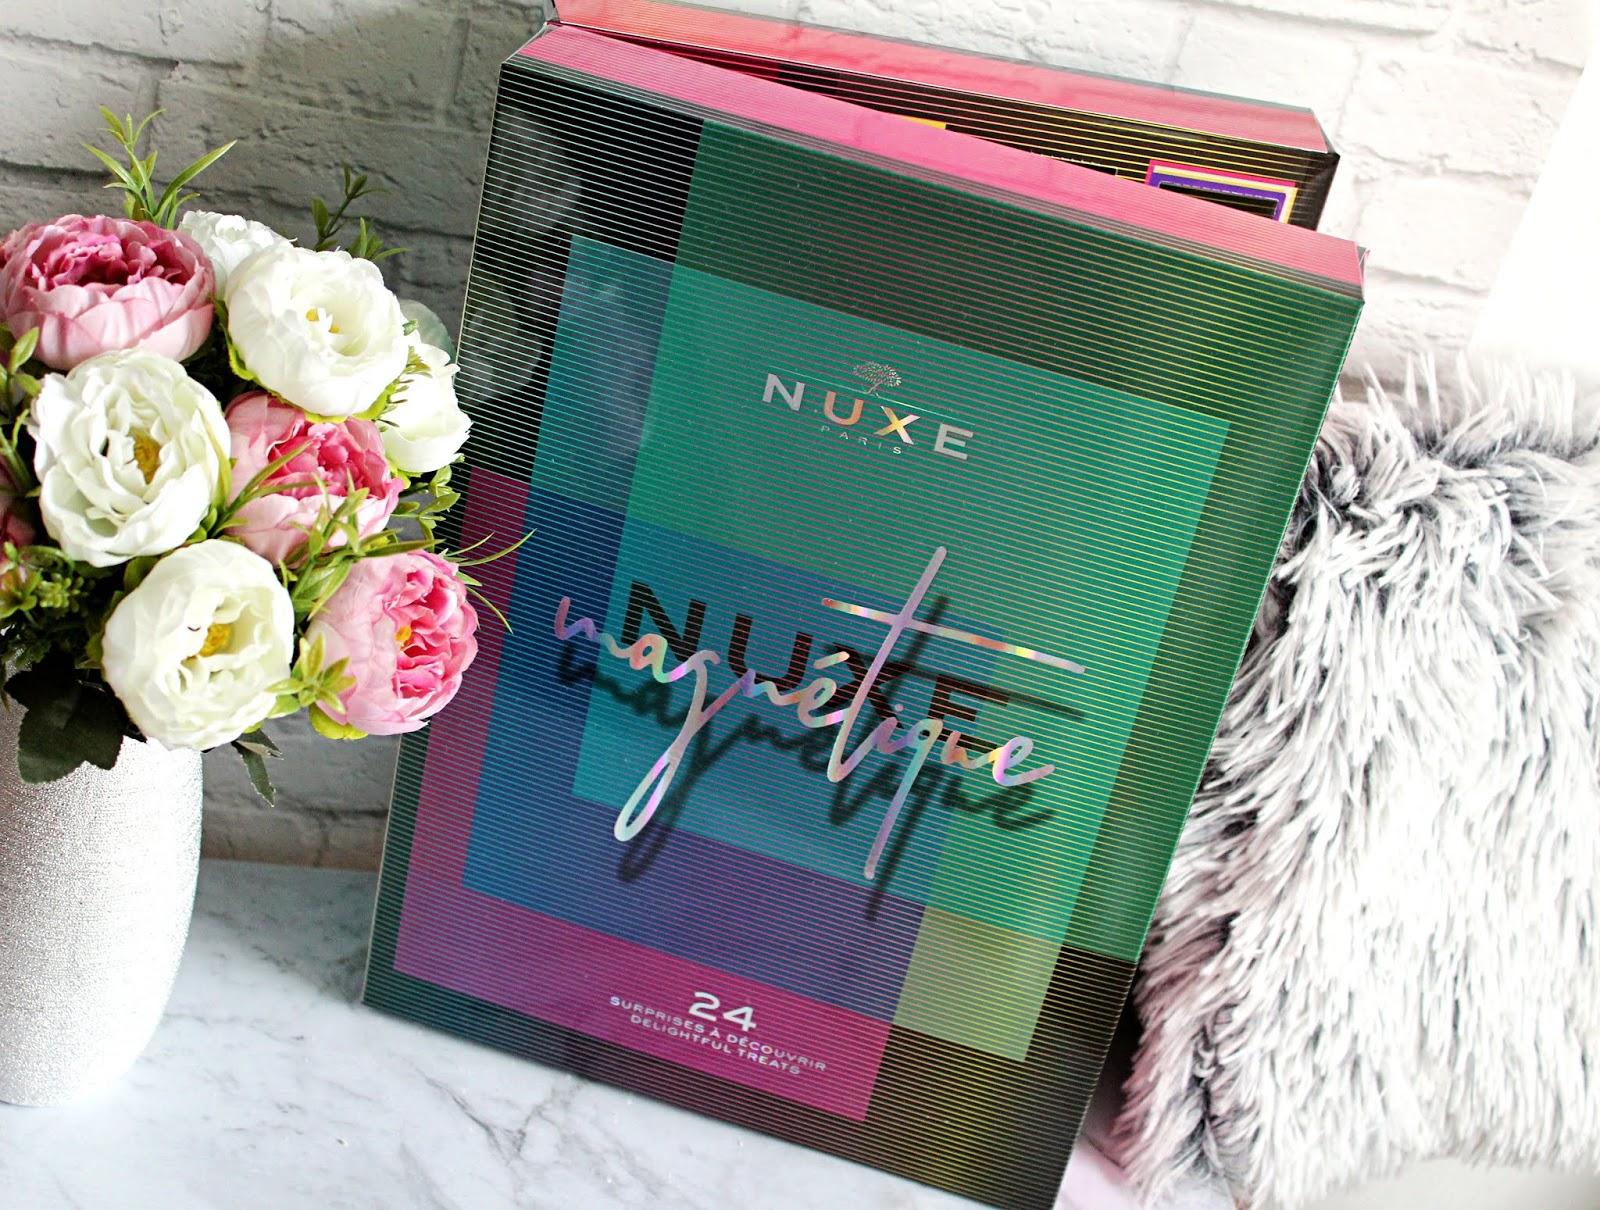 Kalendarz adwentowy Nuxe 2019